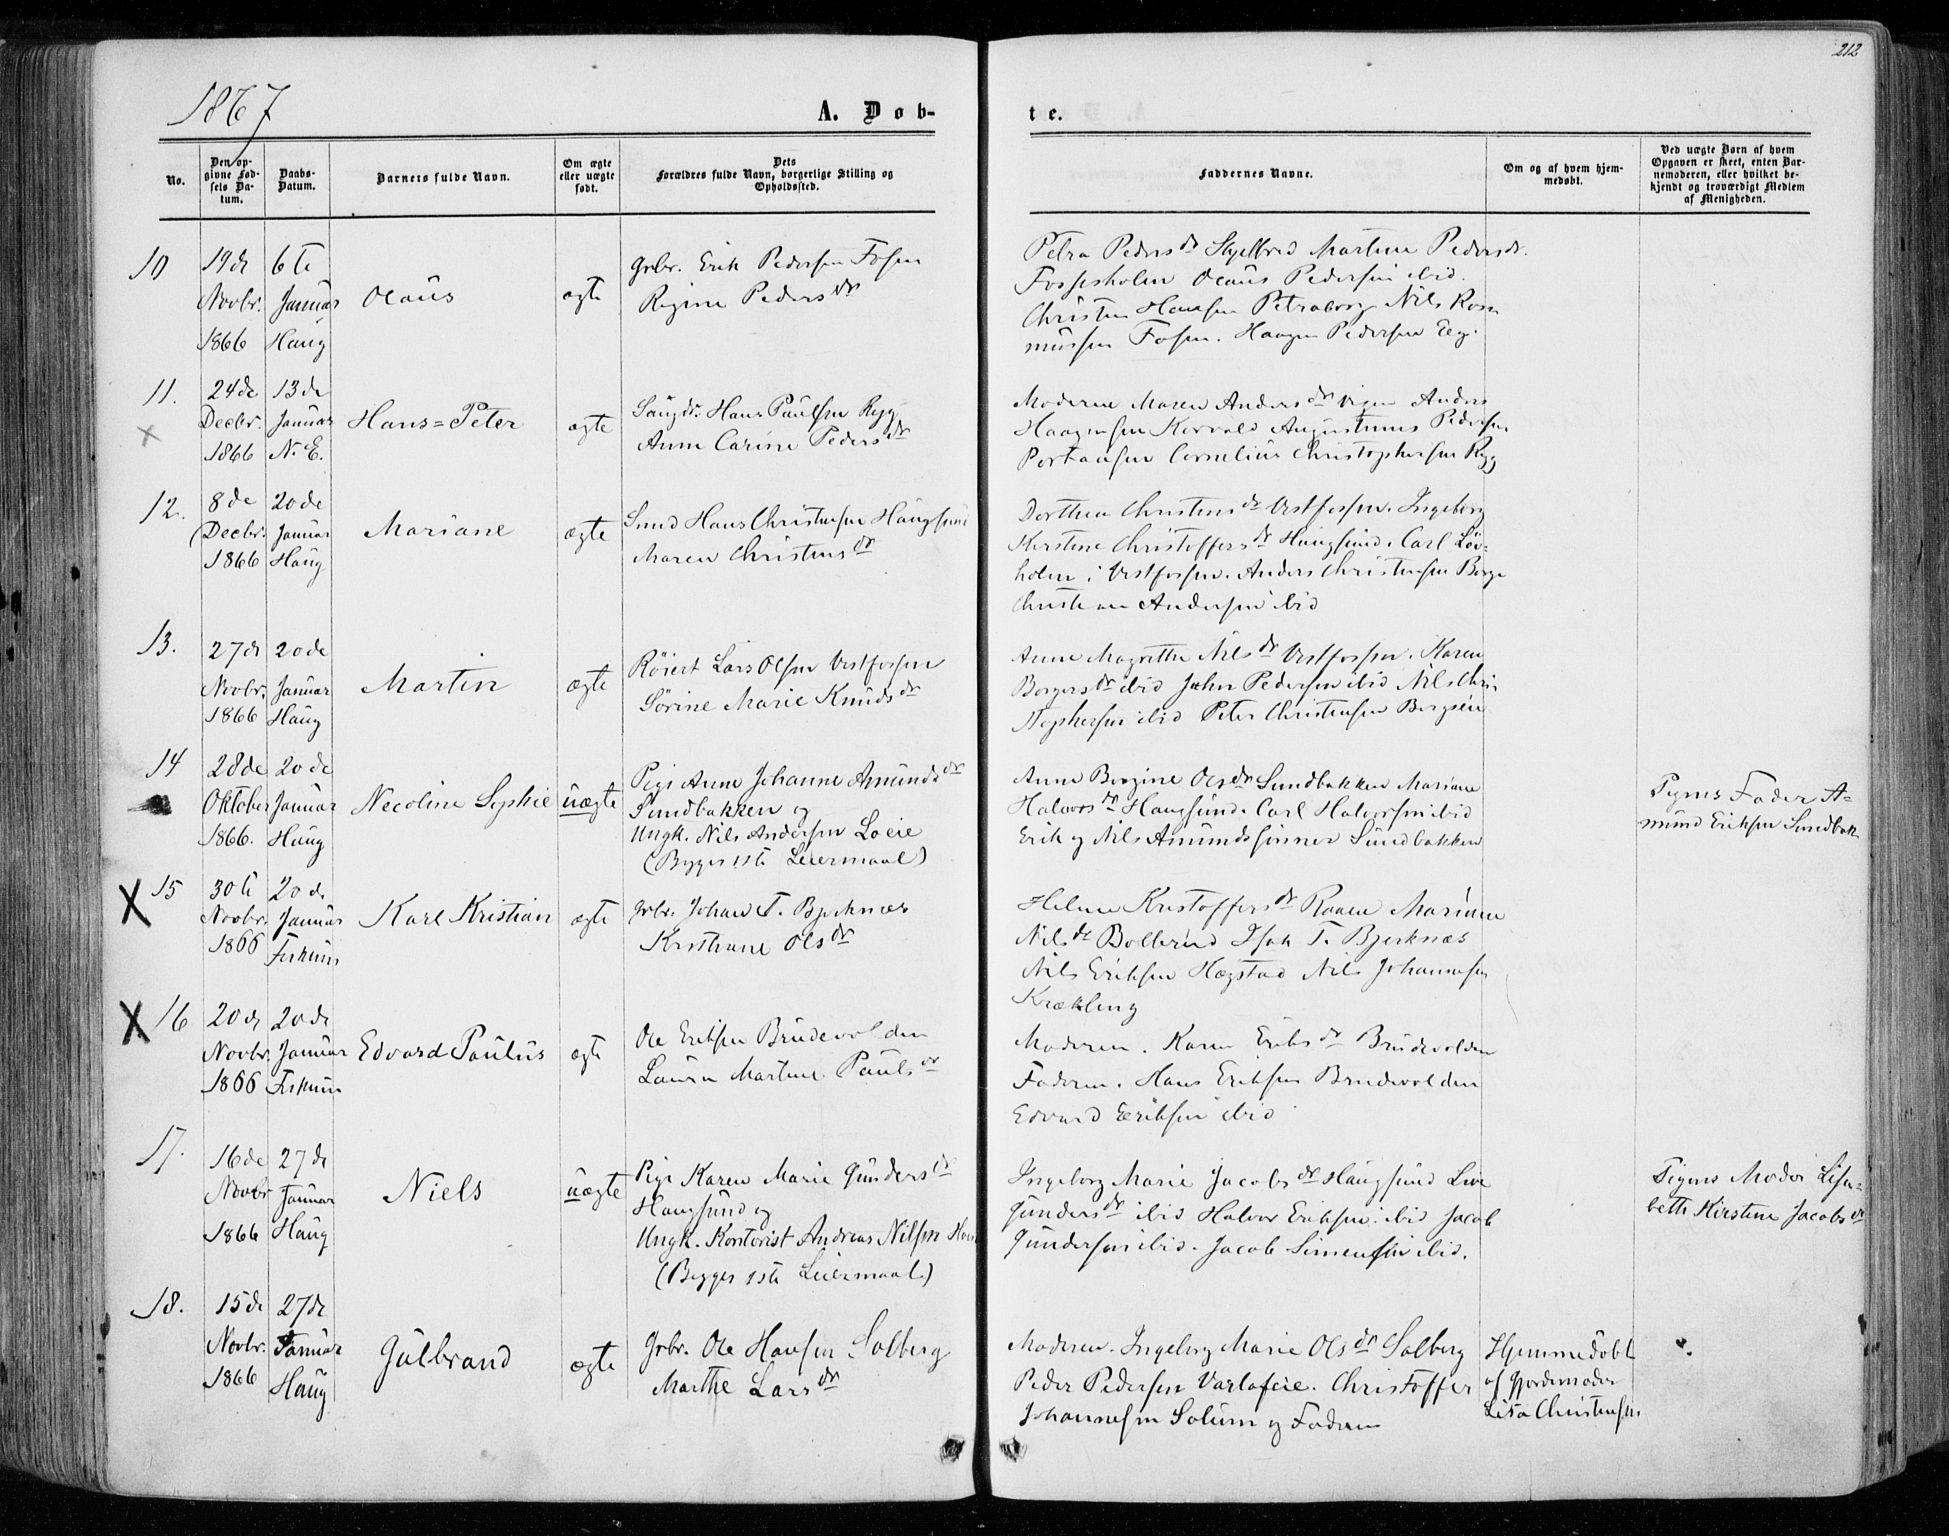 SAKO, Eiker kirkebøker, F/Fa/L0016: Ministerialbok nr. 16, 1860-1868, s. 212